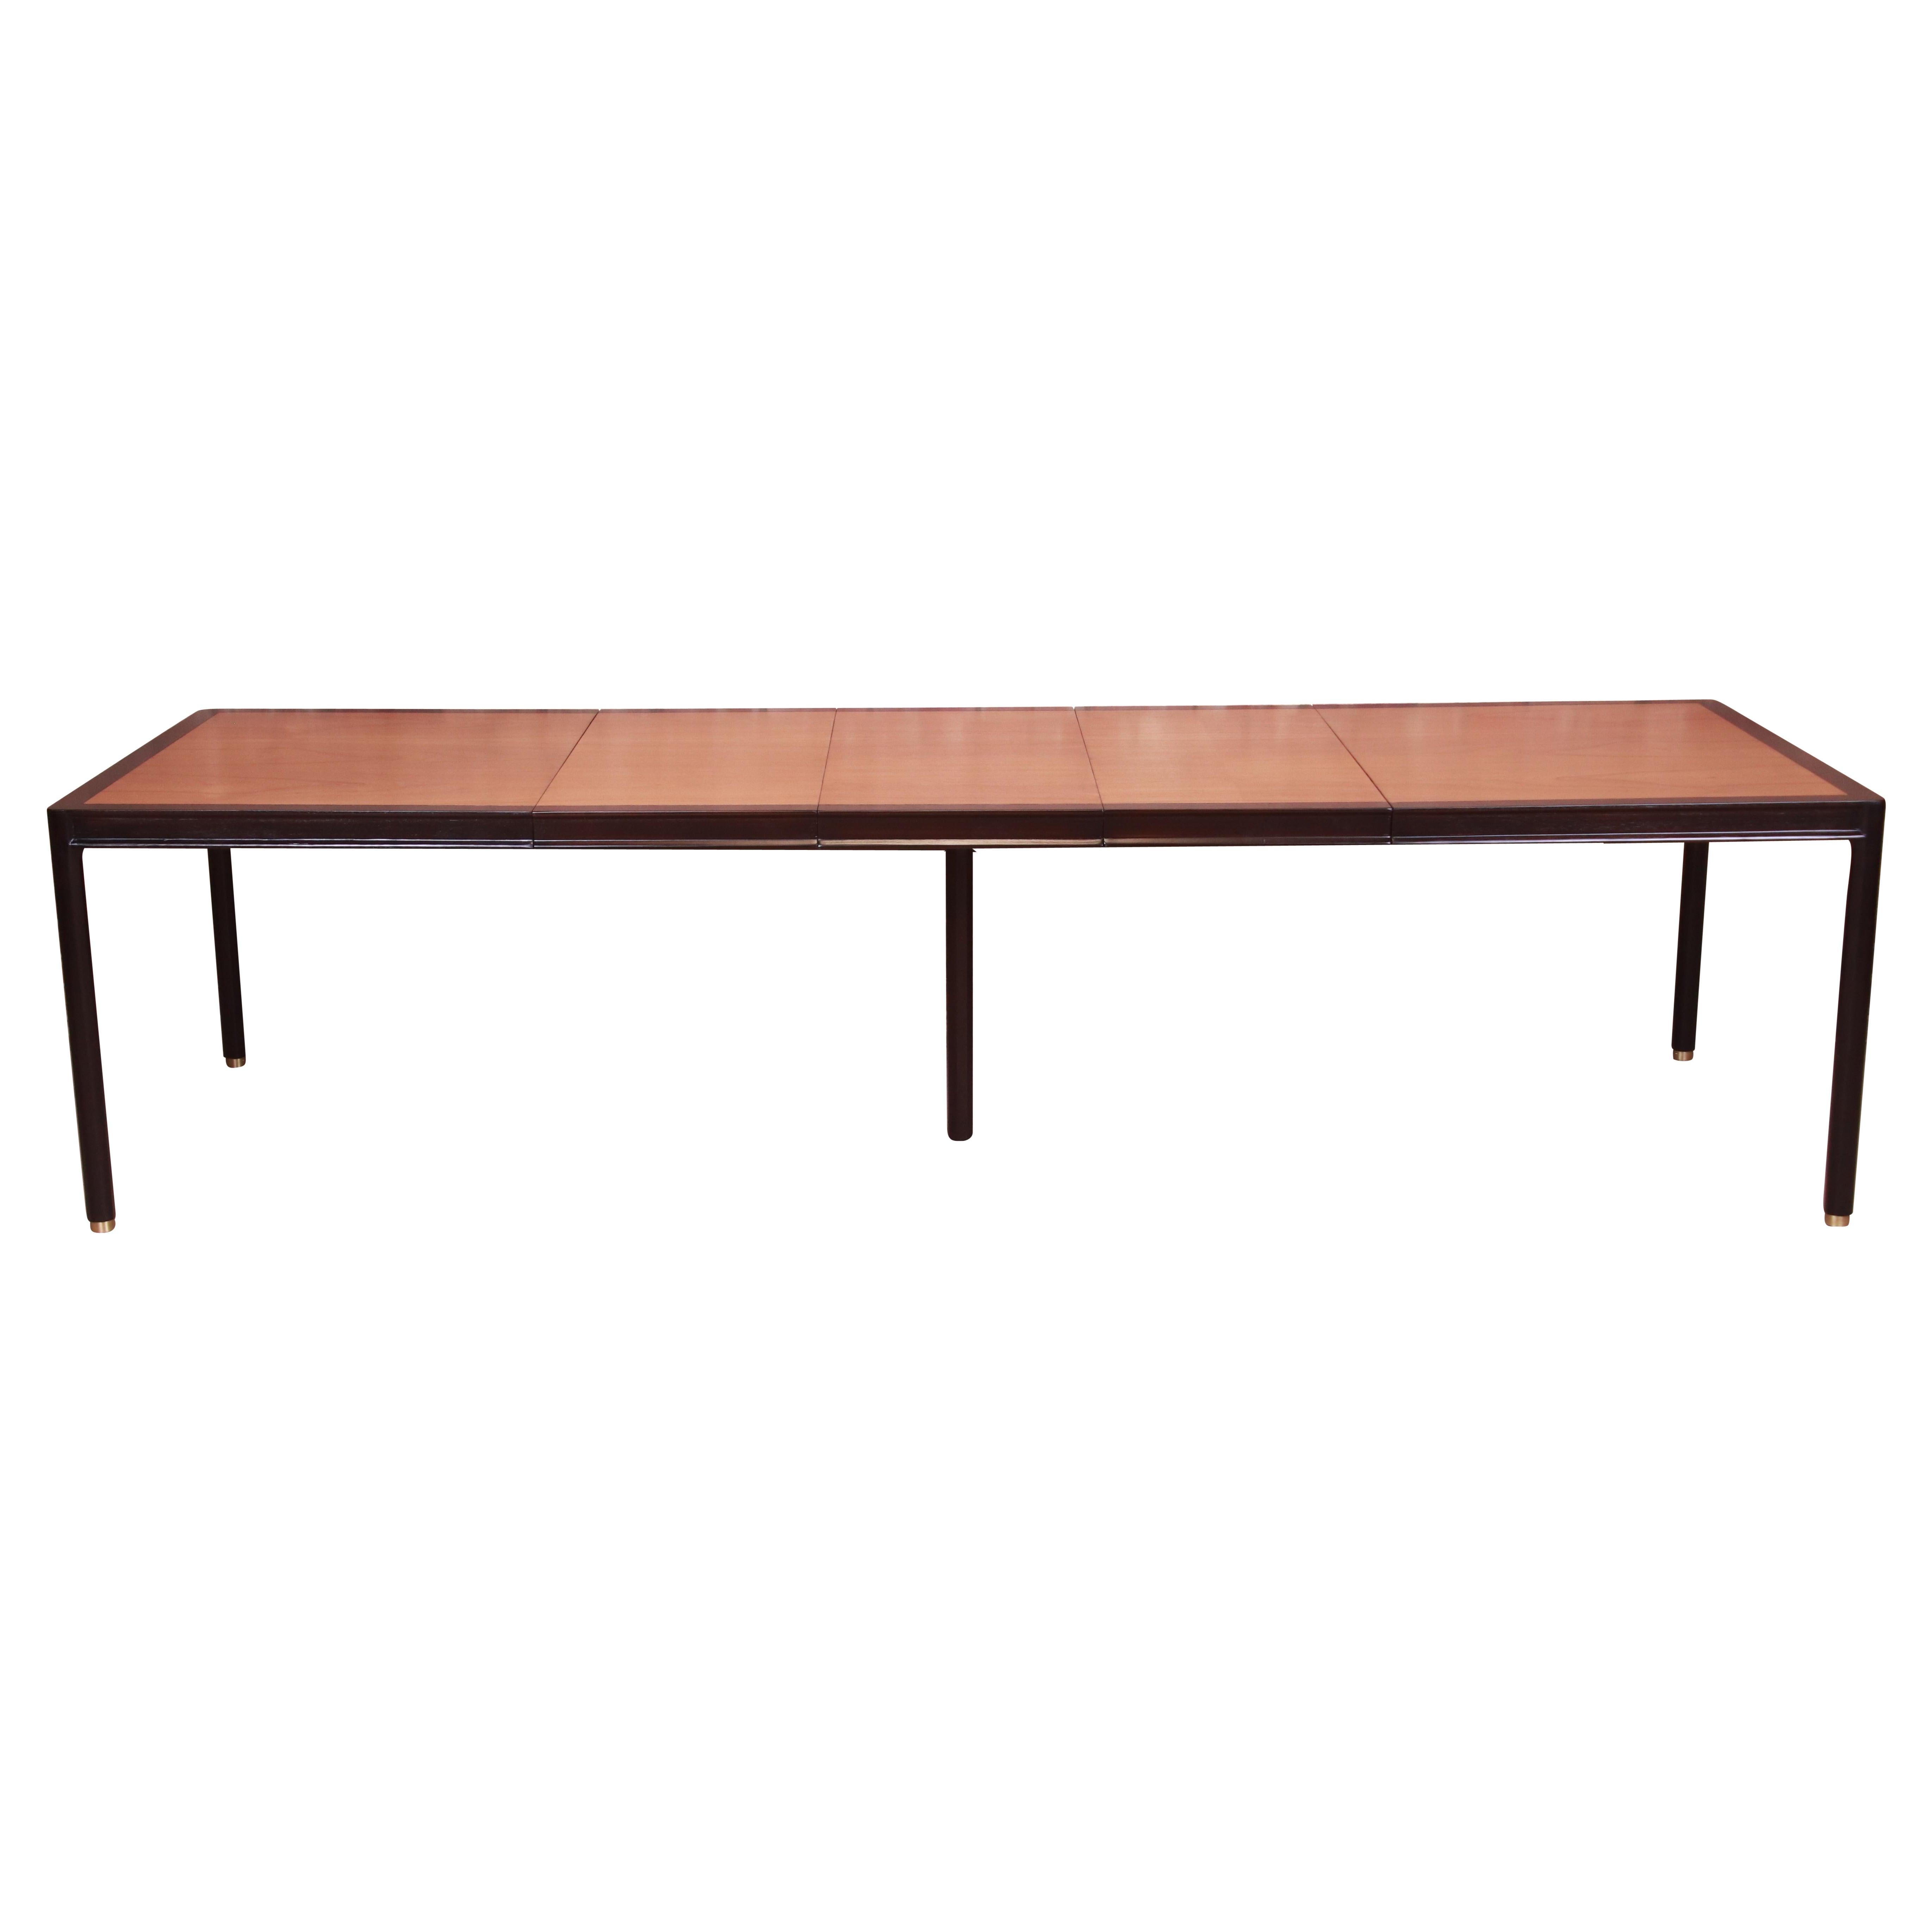 Harvey Probber Teak and Ebonized Mahogany Extension Dining Table, Refinished